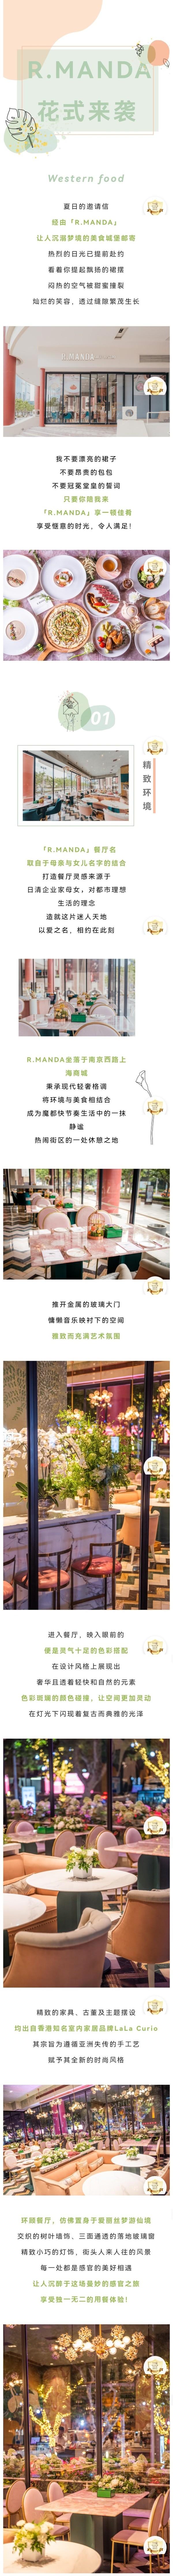 R.MANDA(南京西路店) 2人套餐